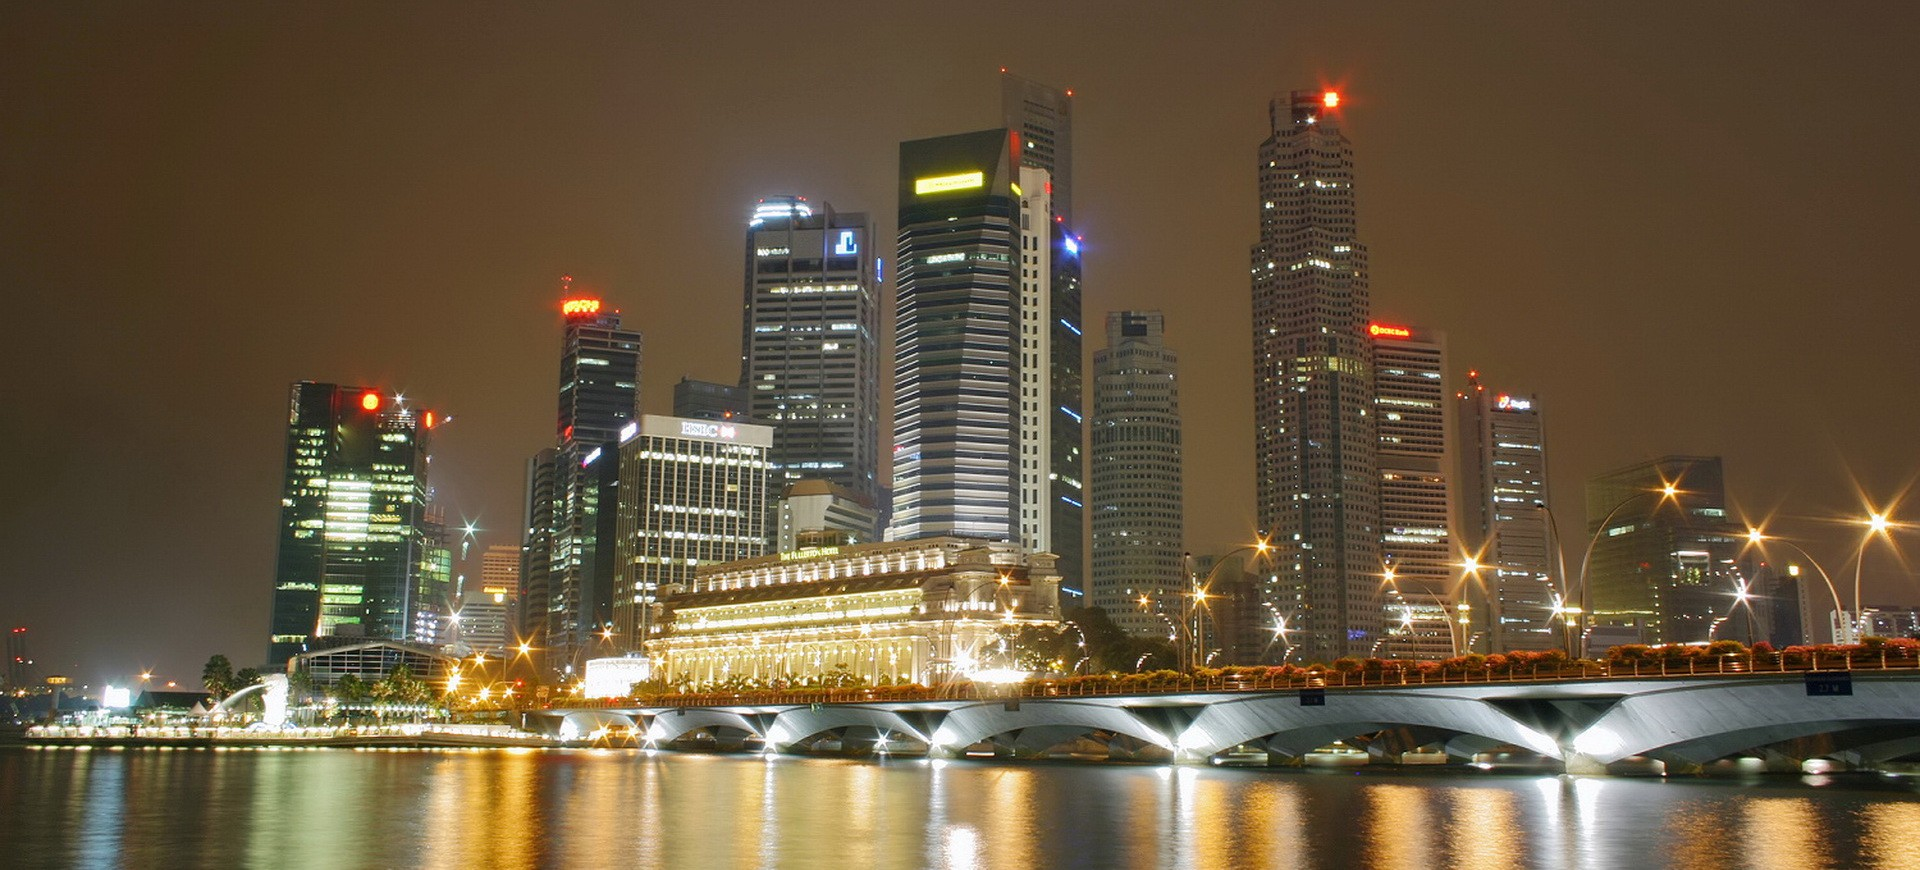 Singapour Skyline by night